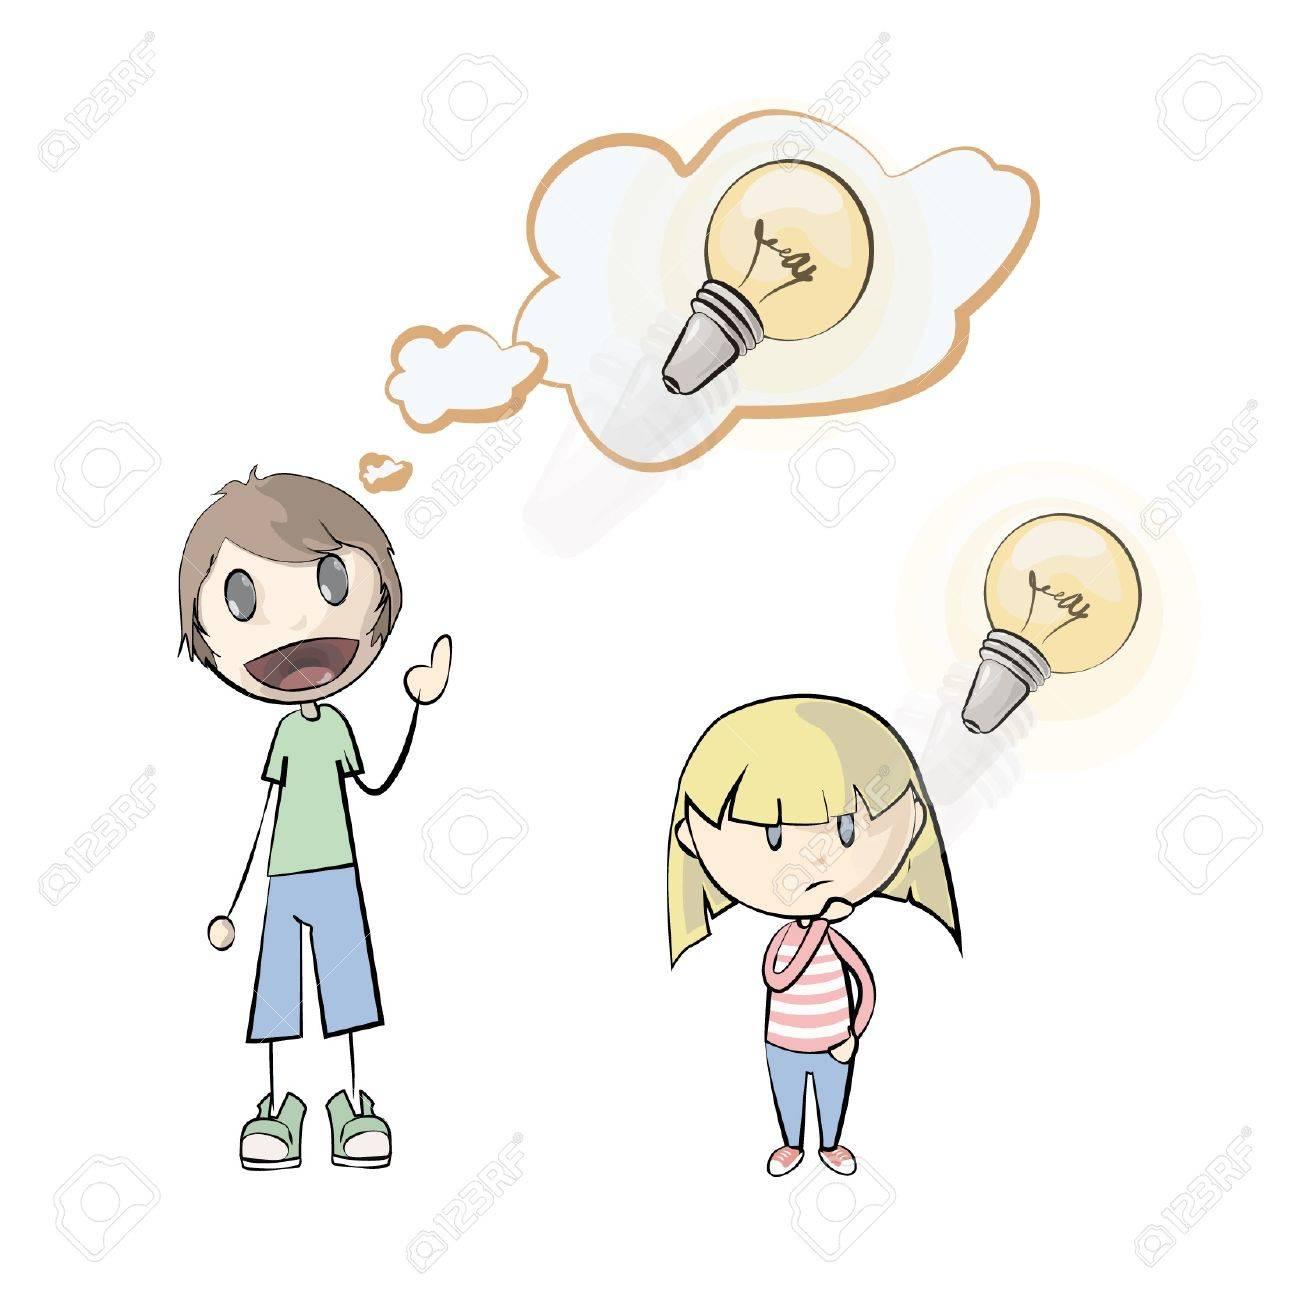 People having an idea  Vector illustration Stock Vector - 17344440